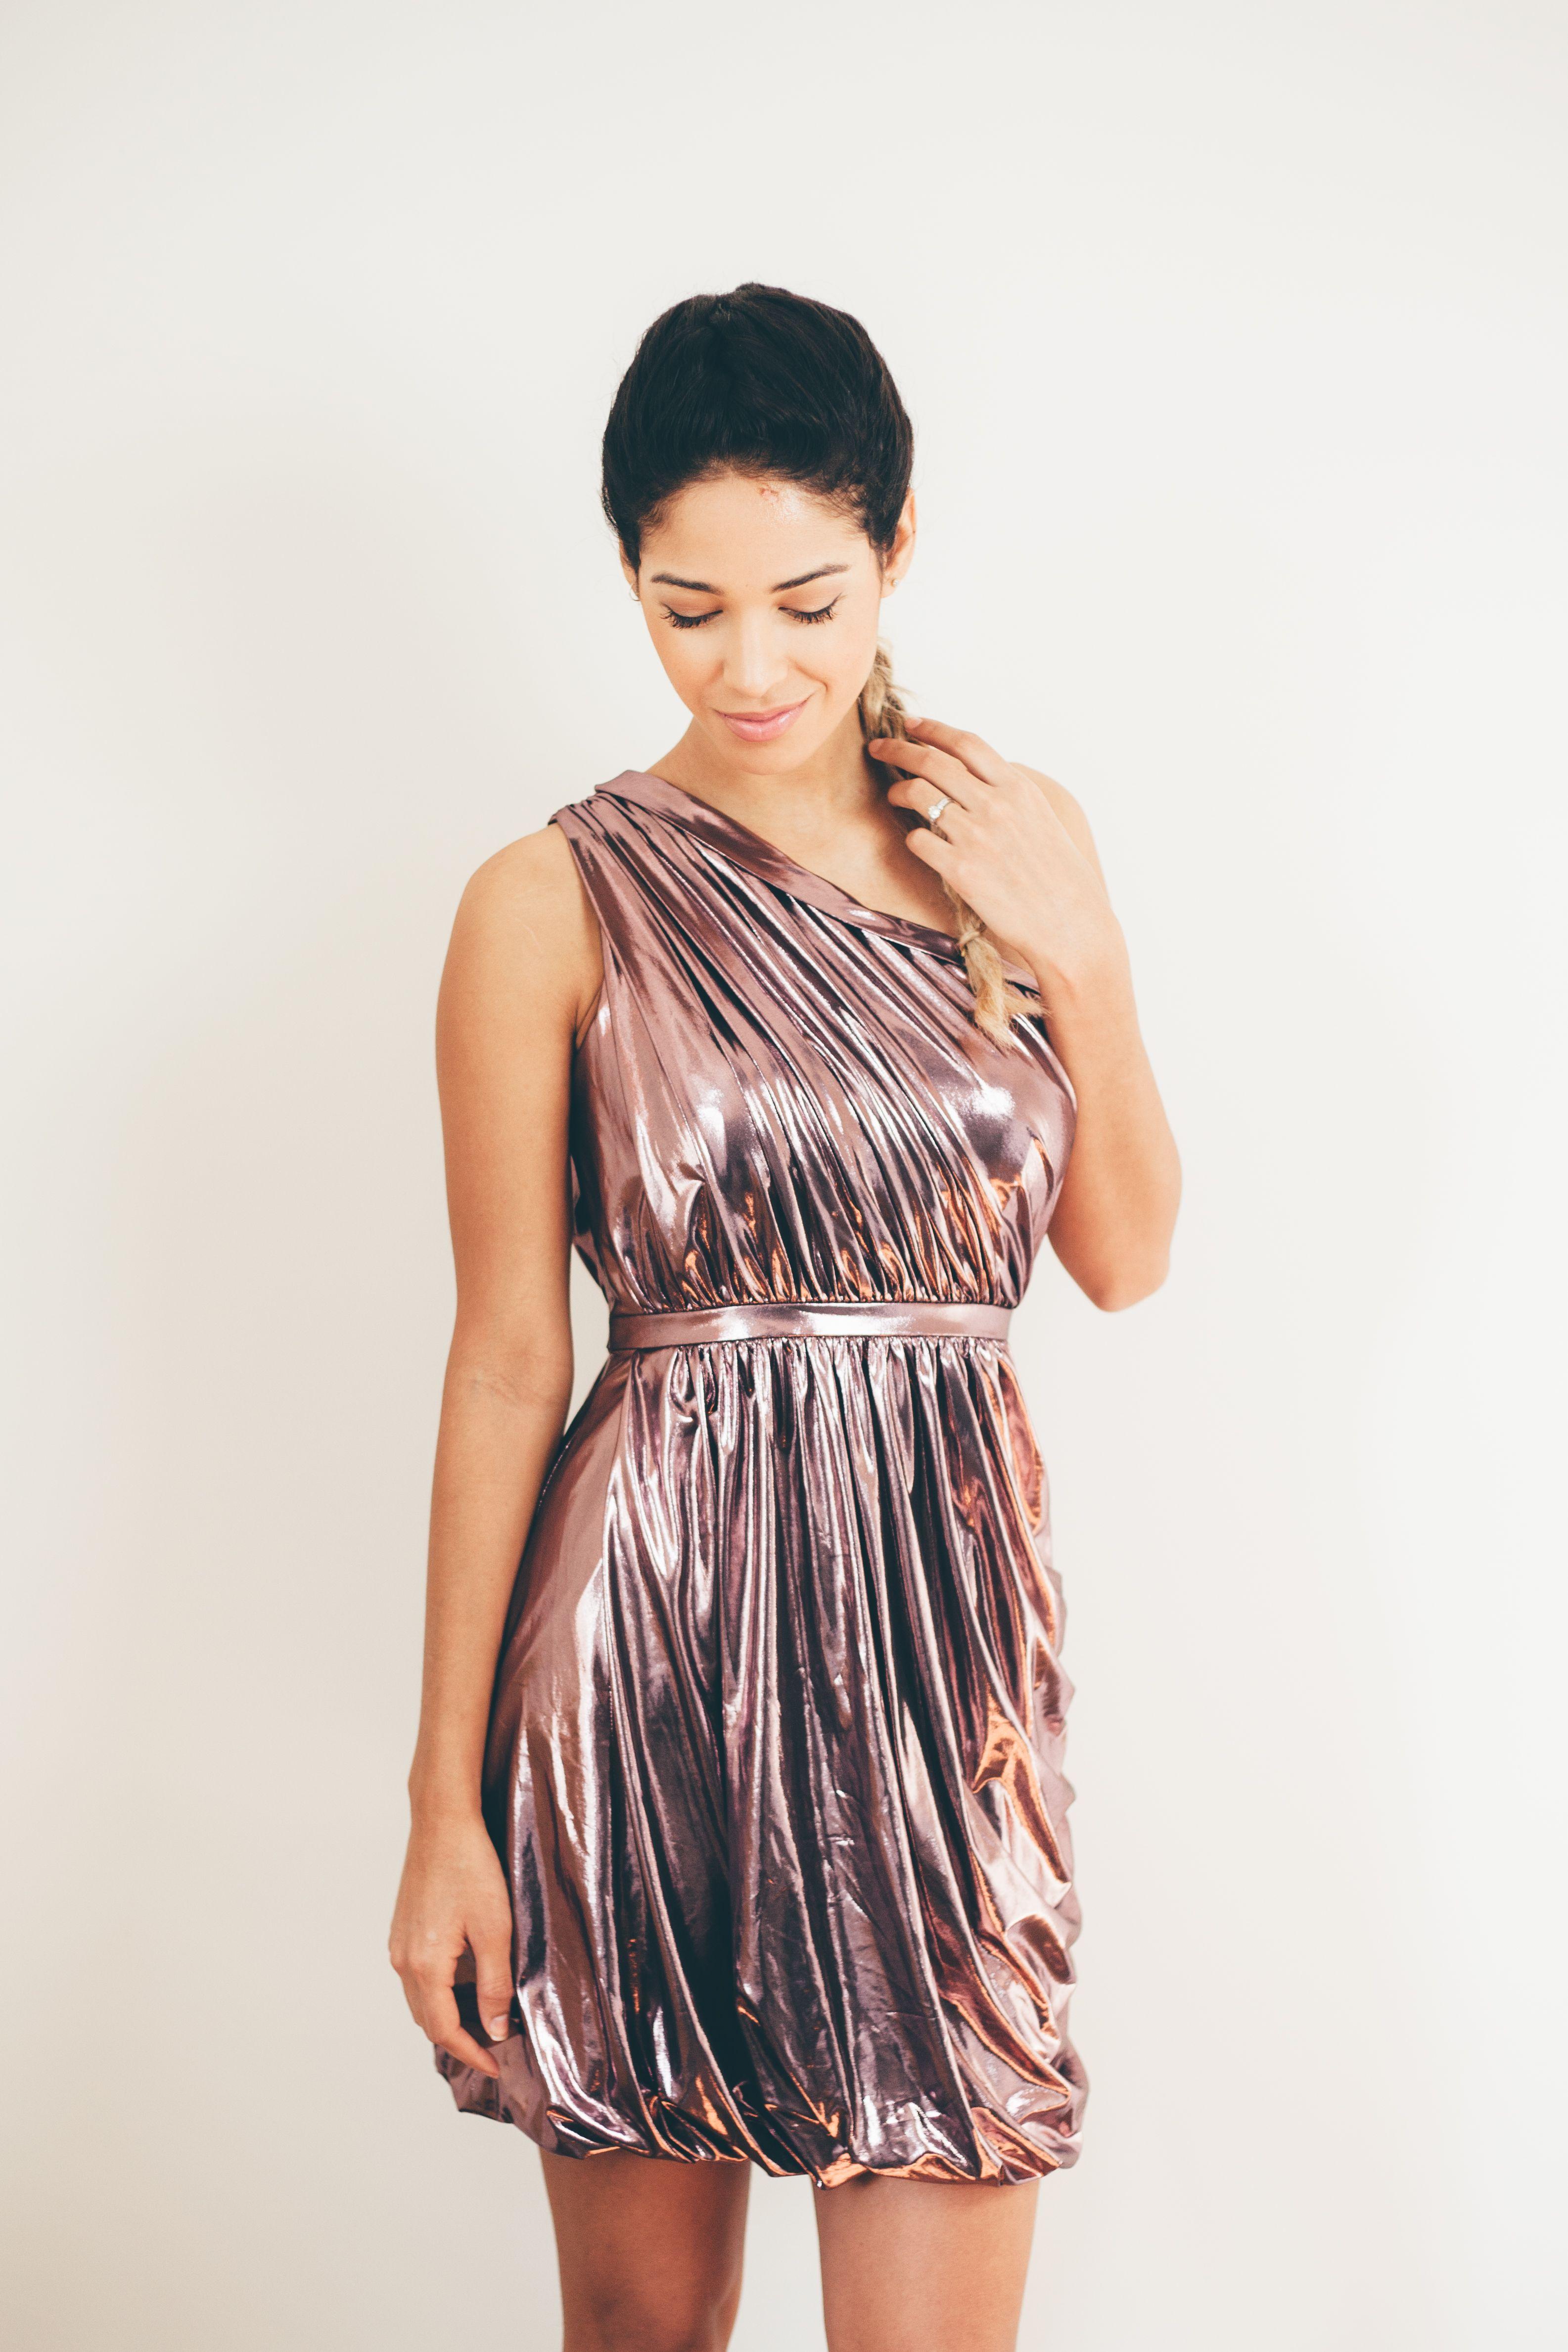 https://www.tradesy.com/dresses/phoebe-couture-dress-pink-13124590/?tref=closet